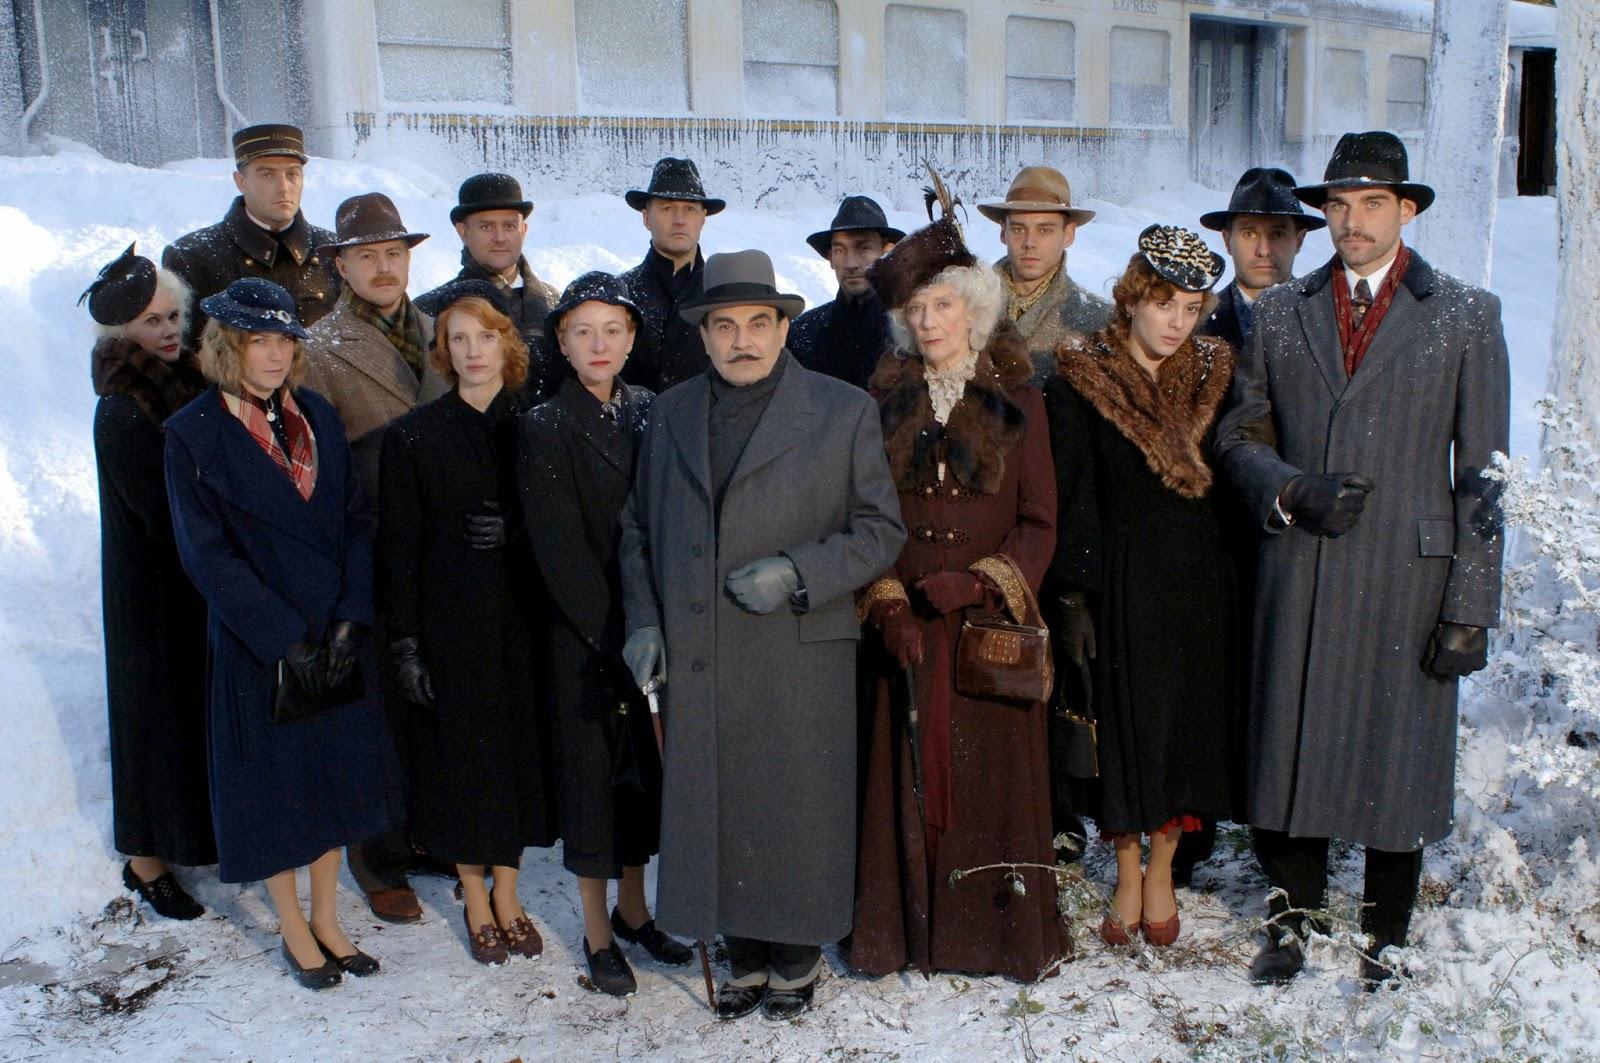 Investigating Agatha Christie's Poirot: Episode-by-episode: Murder on the Orient Express